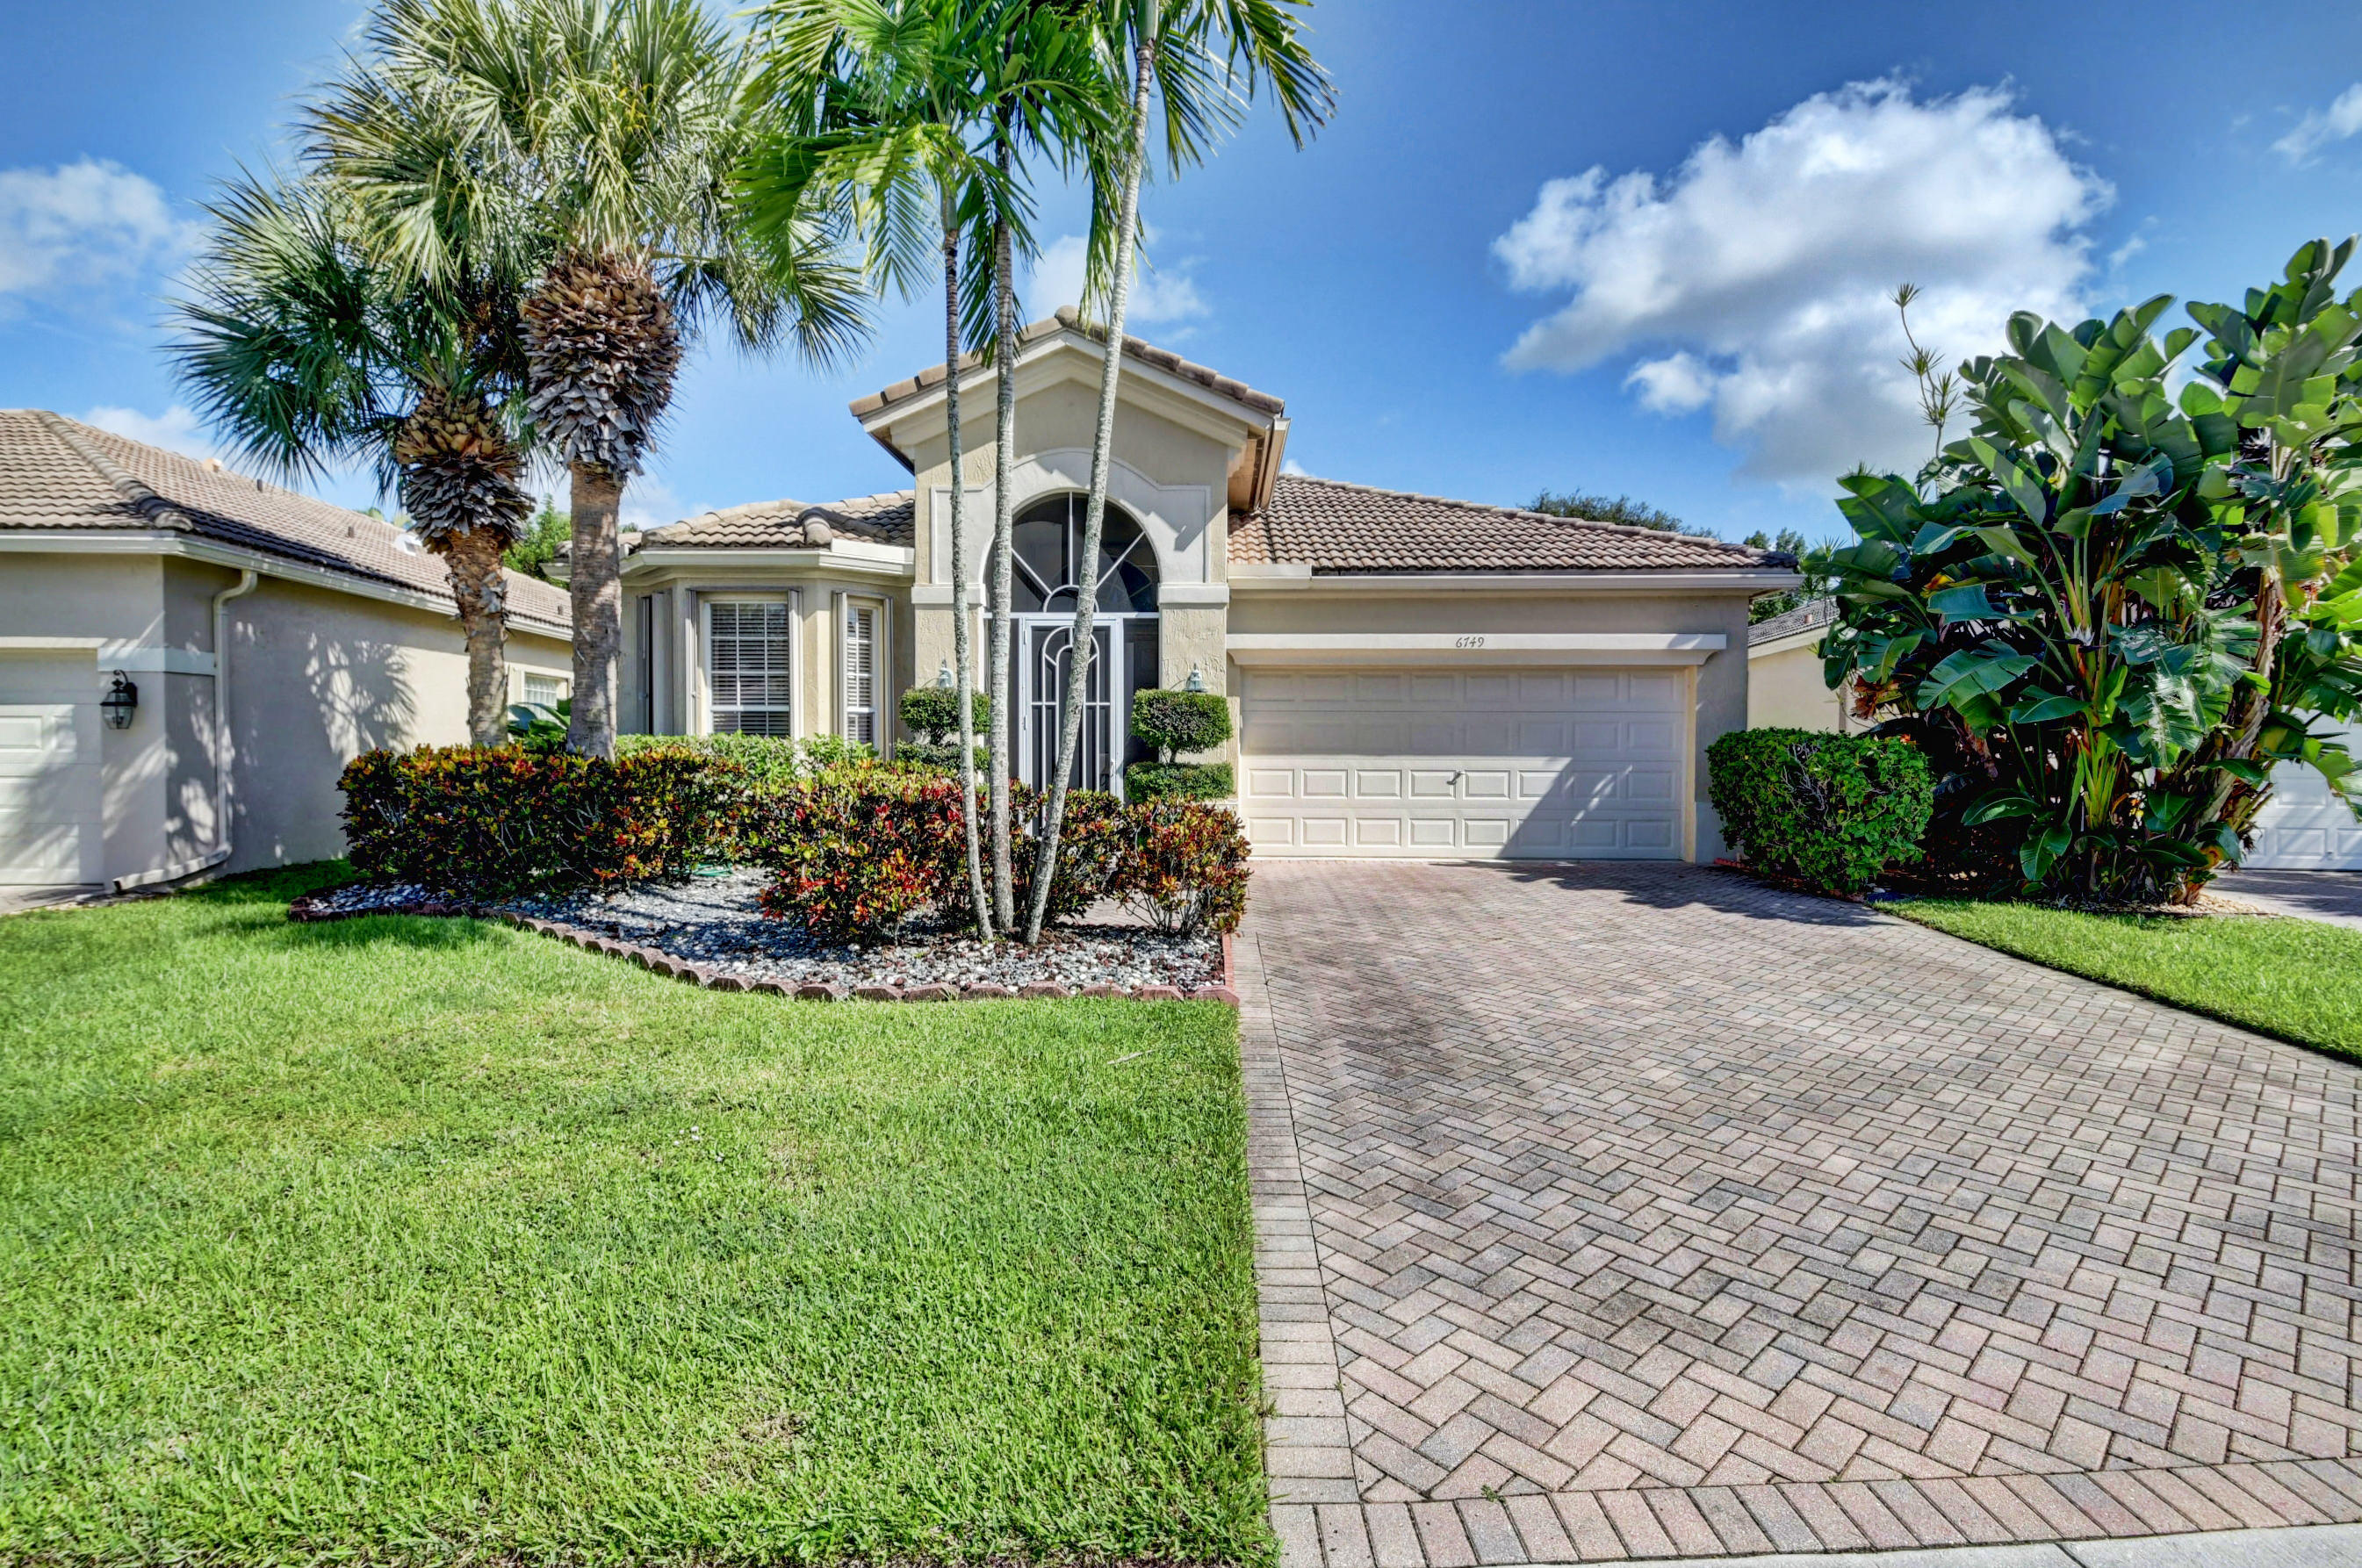 Home for sale in Aberdeen Golf & Country Club Boynton Beach Florida